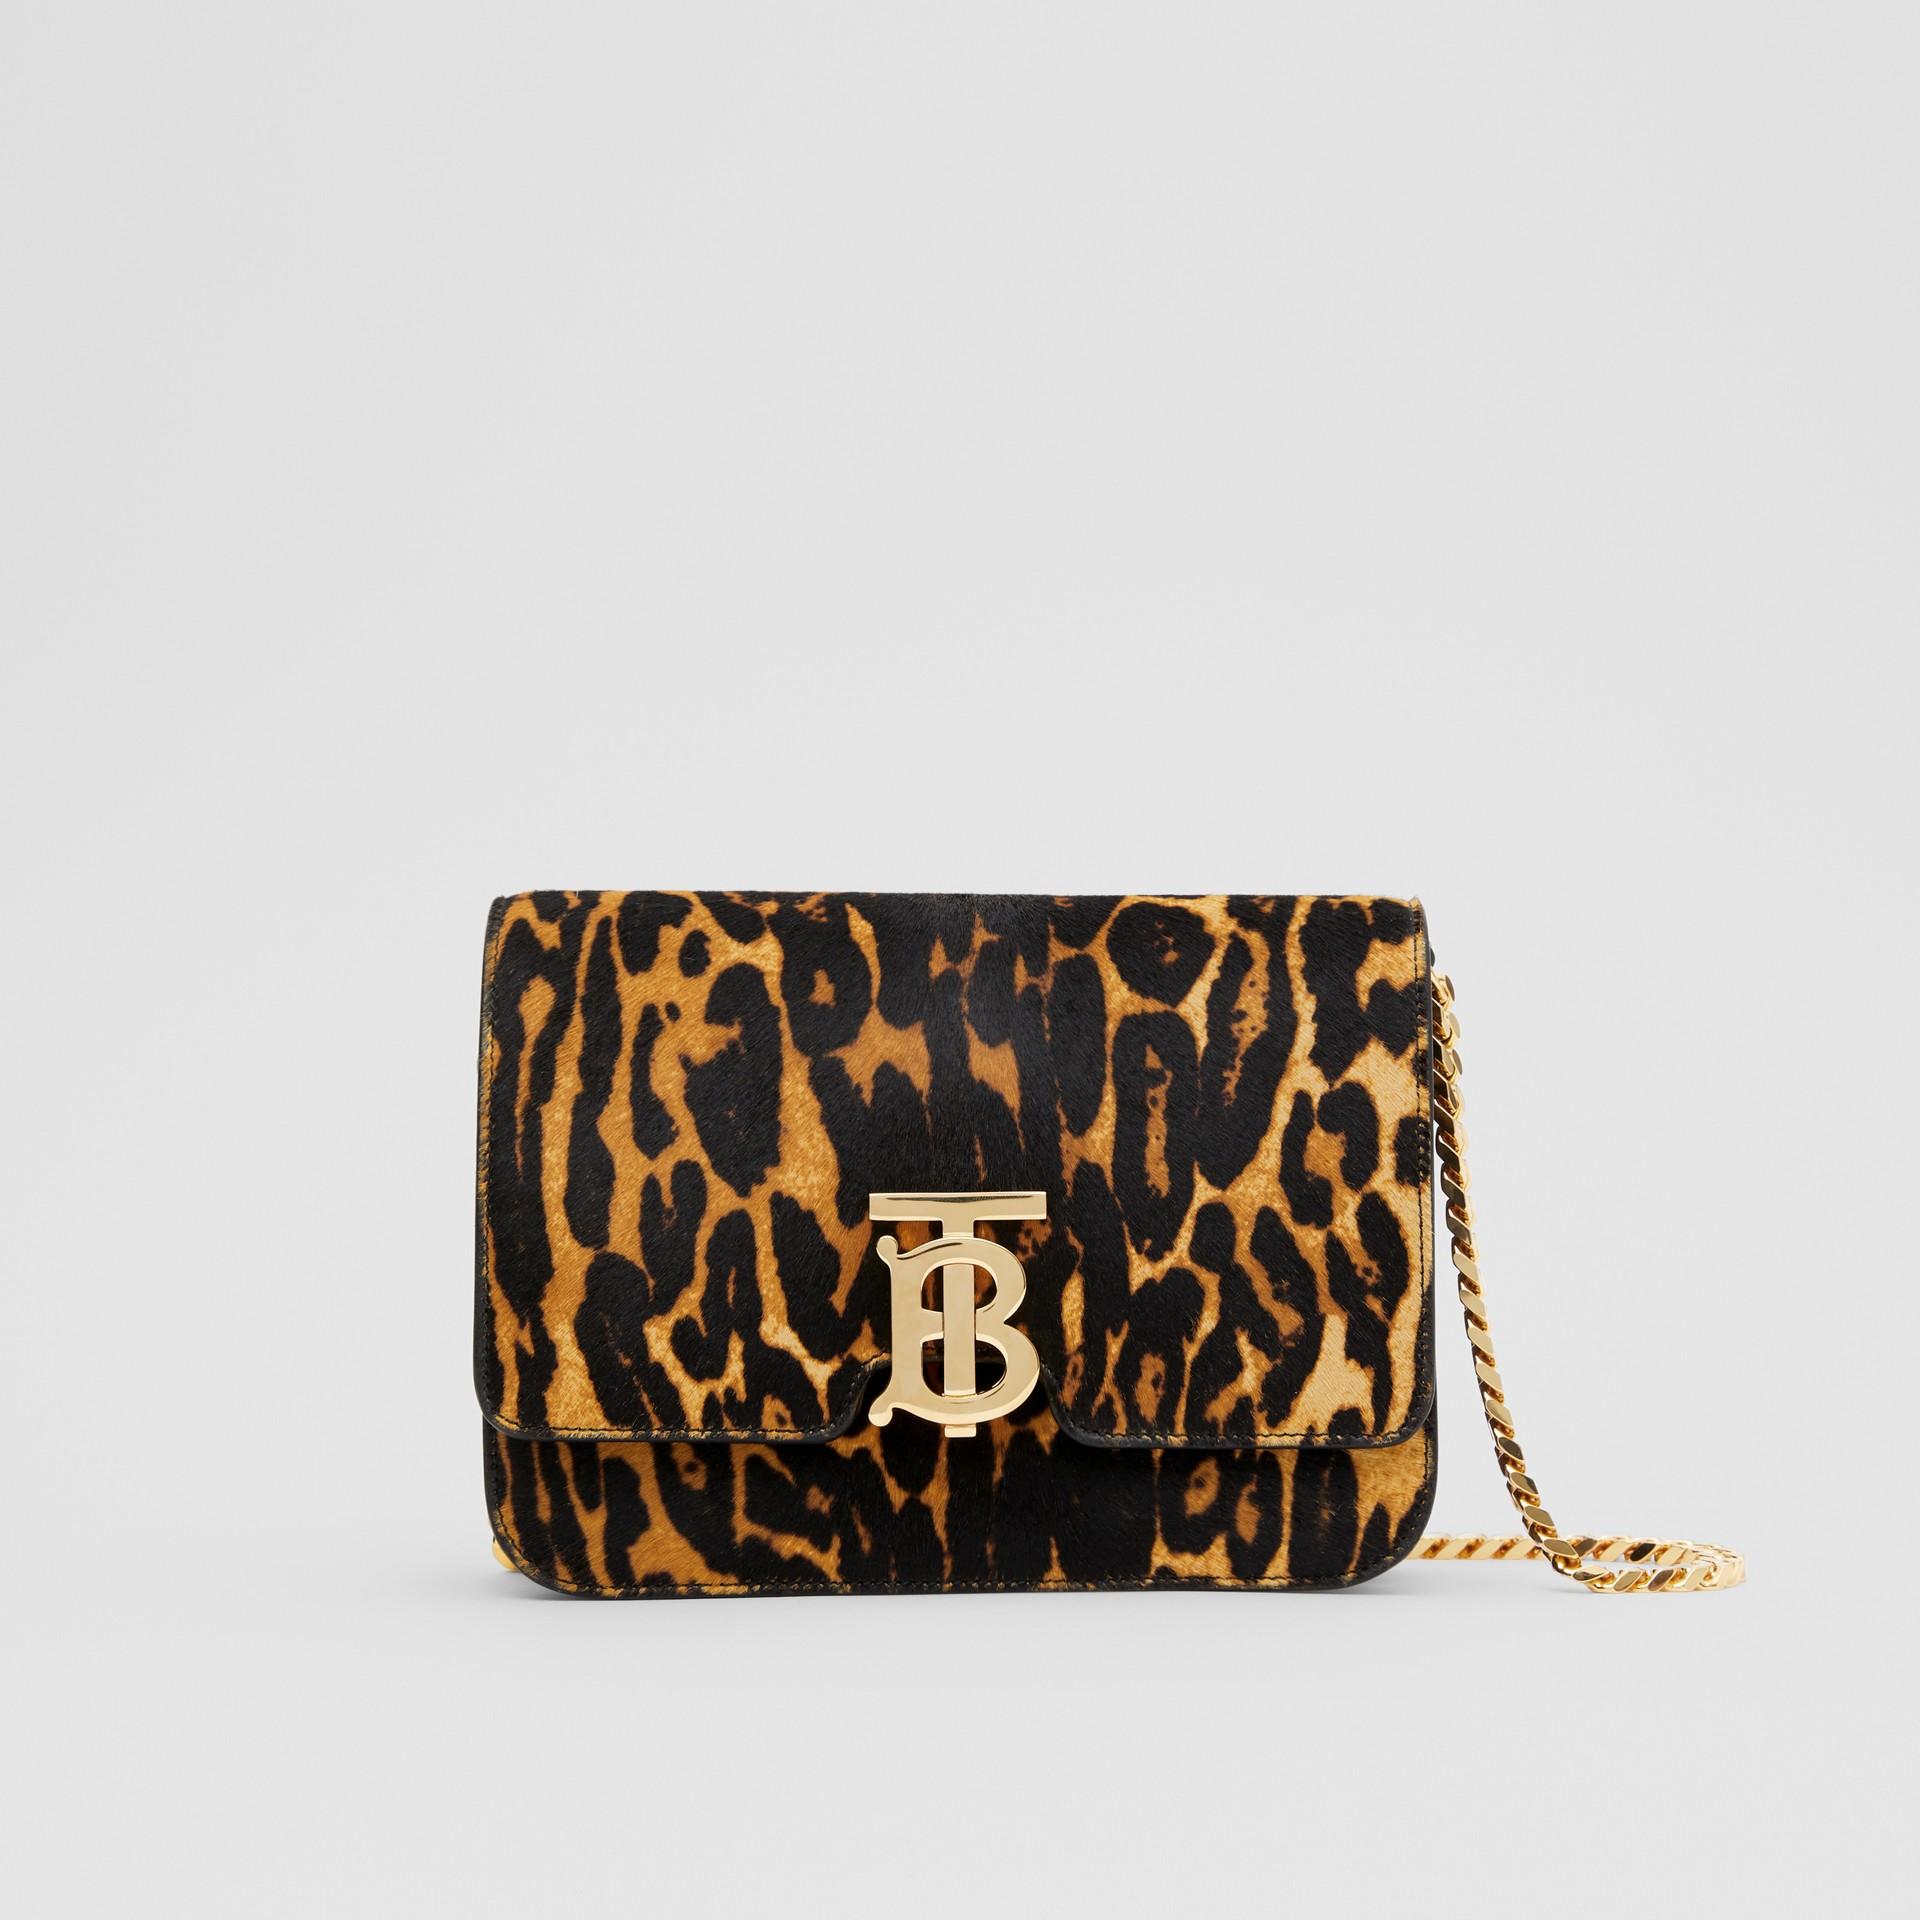 Small Leopard Print Calf Hair TB Bag in Dark Mustard - Women | Burberry Hong Kong S.A.R - gallery image 0